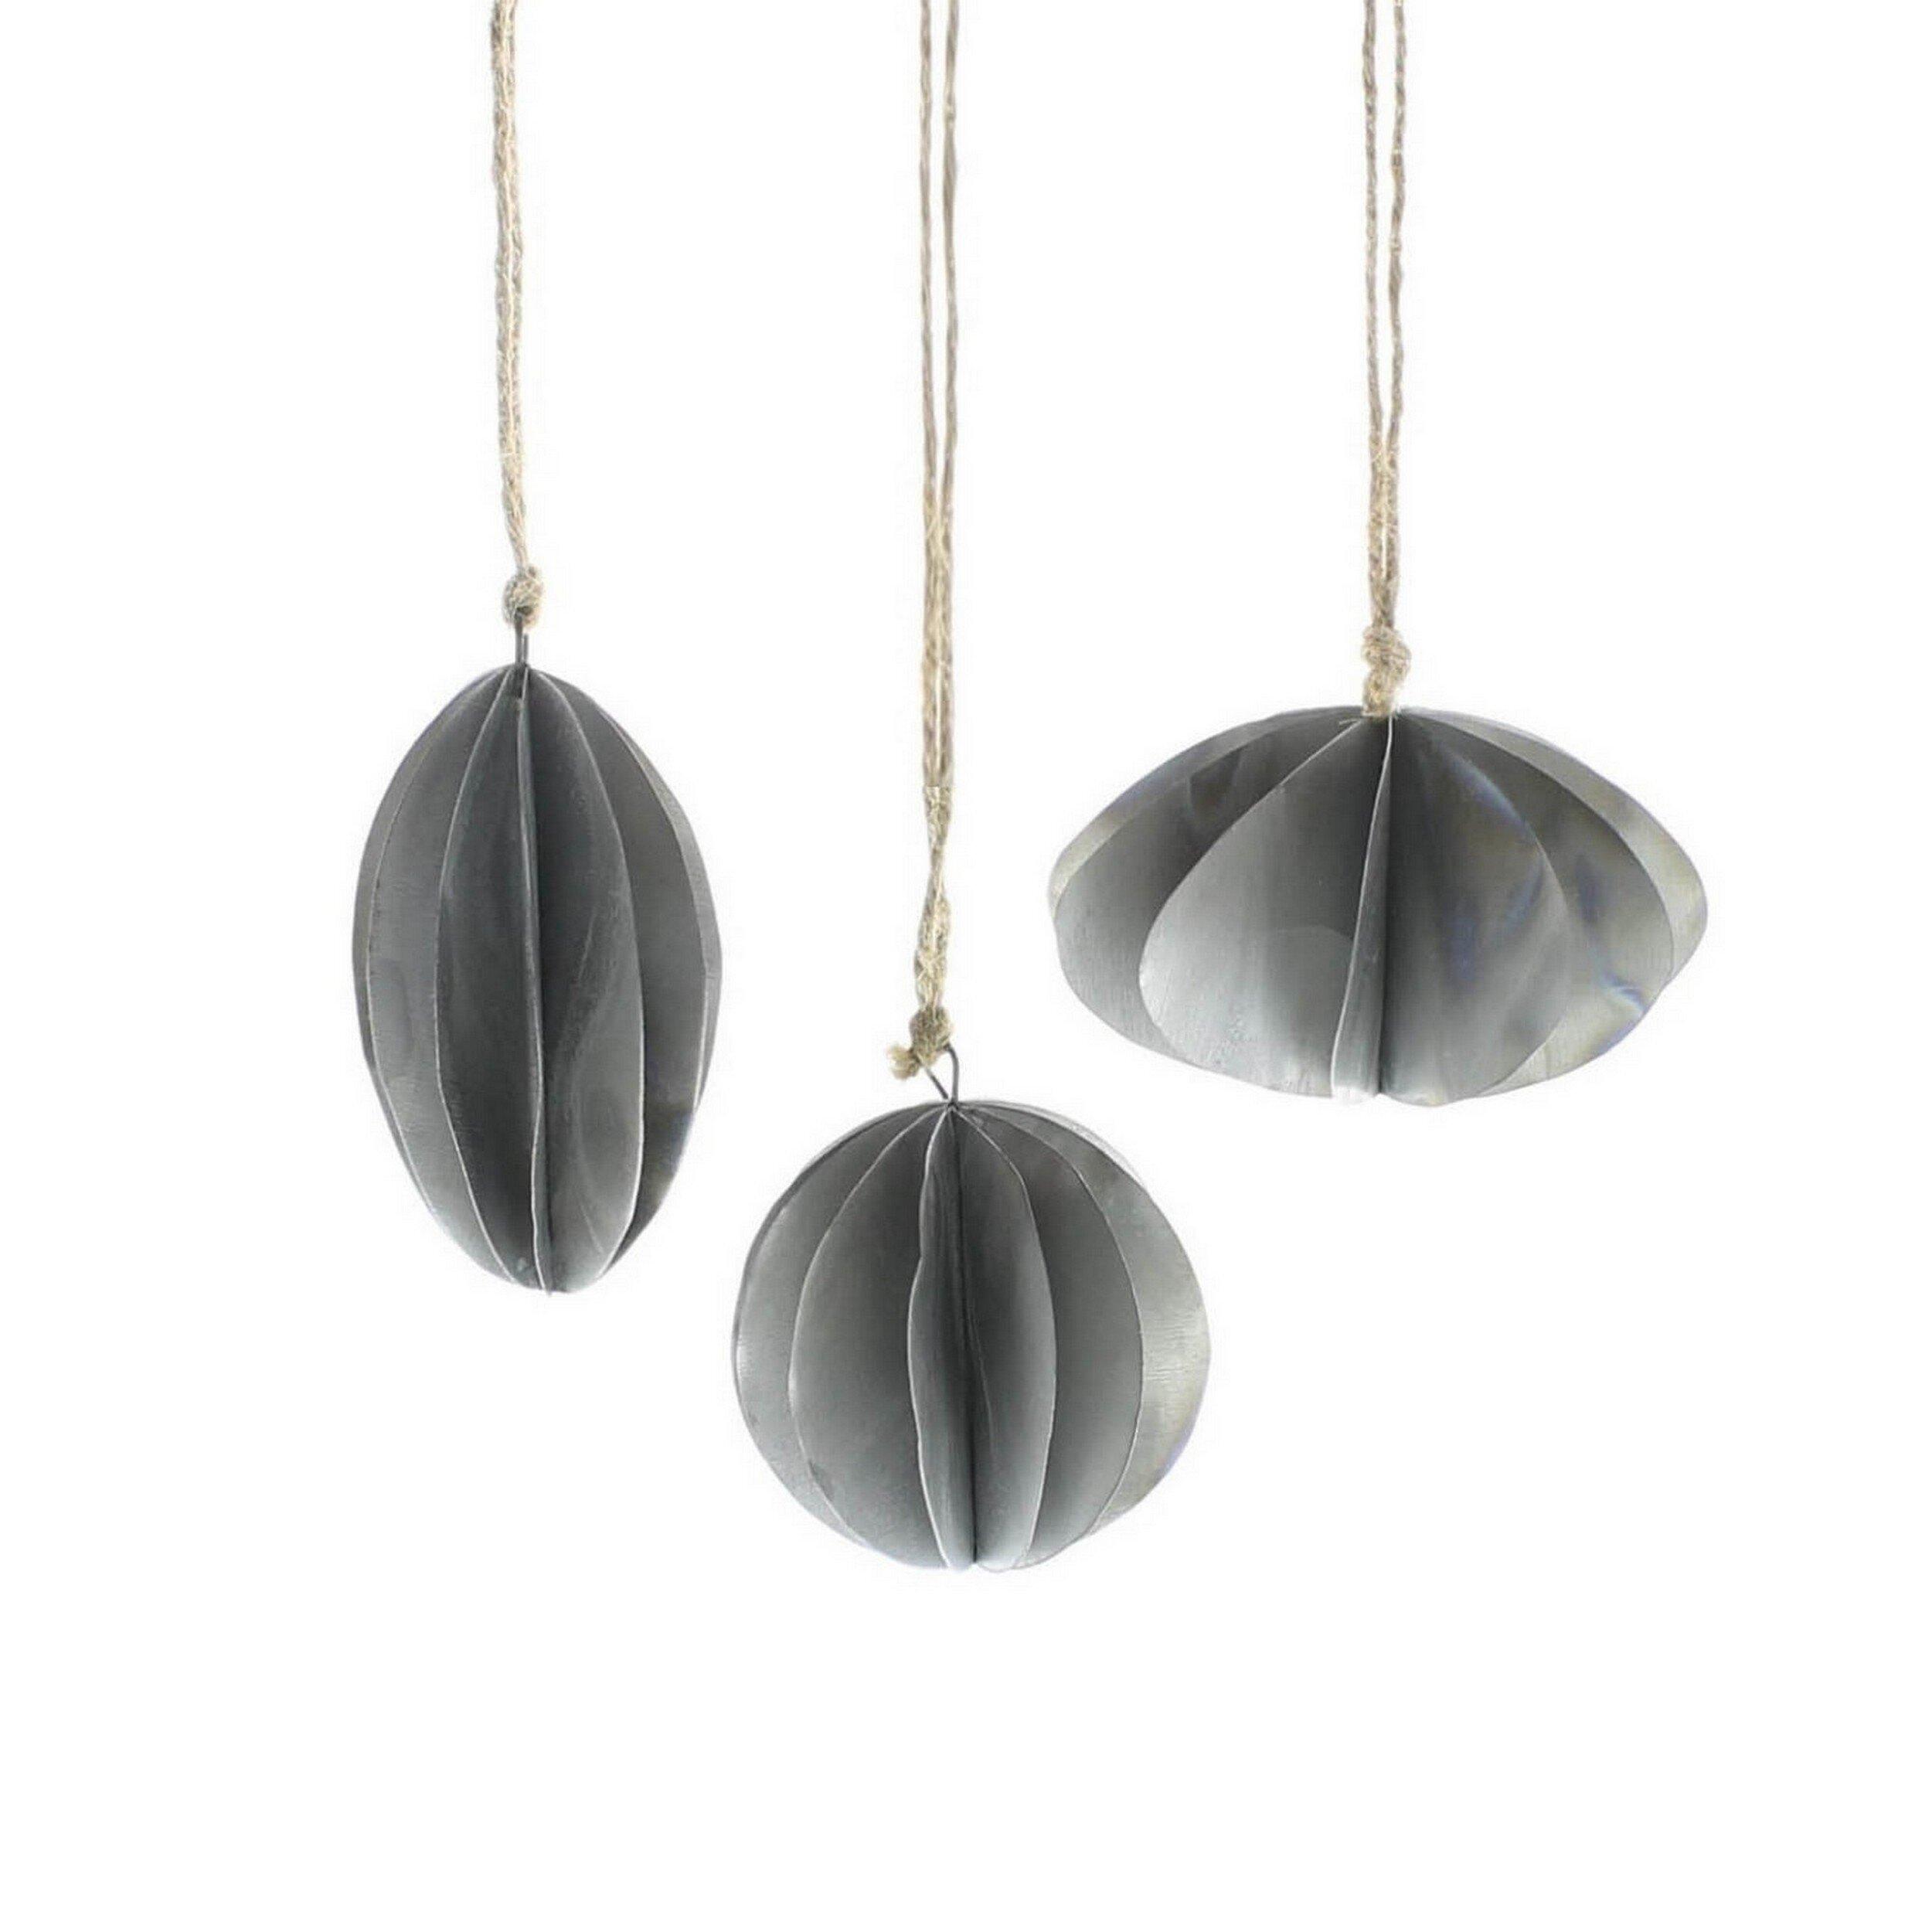 The Holiday Aisle 3 Piece Decorative Round Metal Hanging Figurine Ornament Set Wayfair